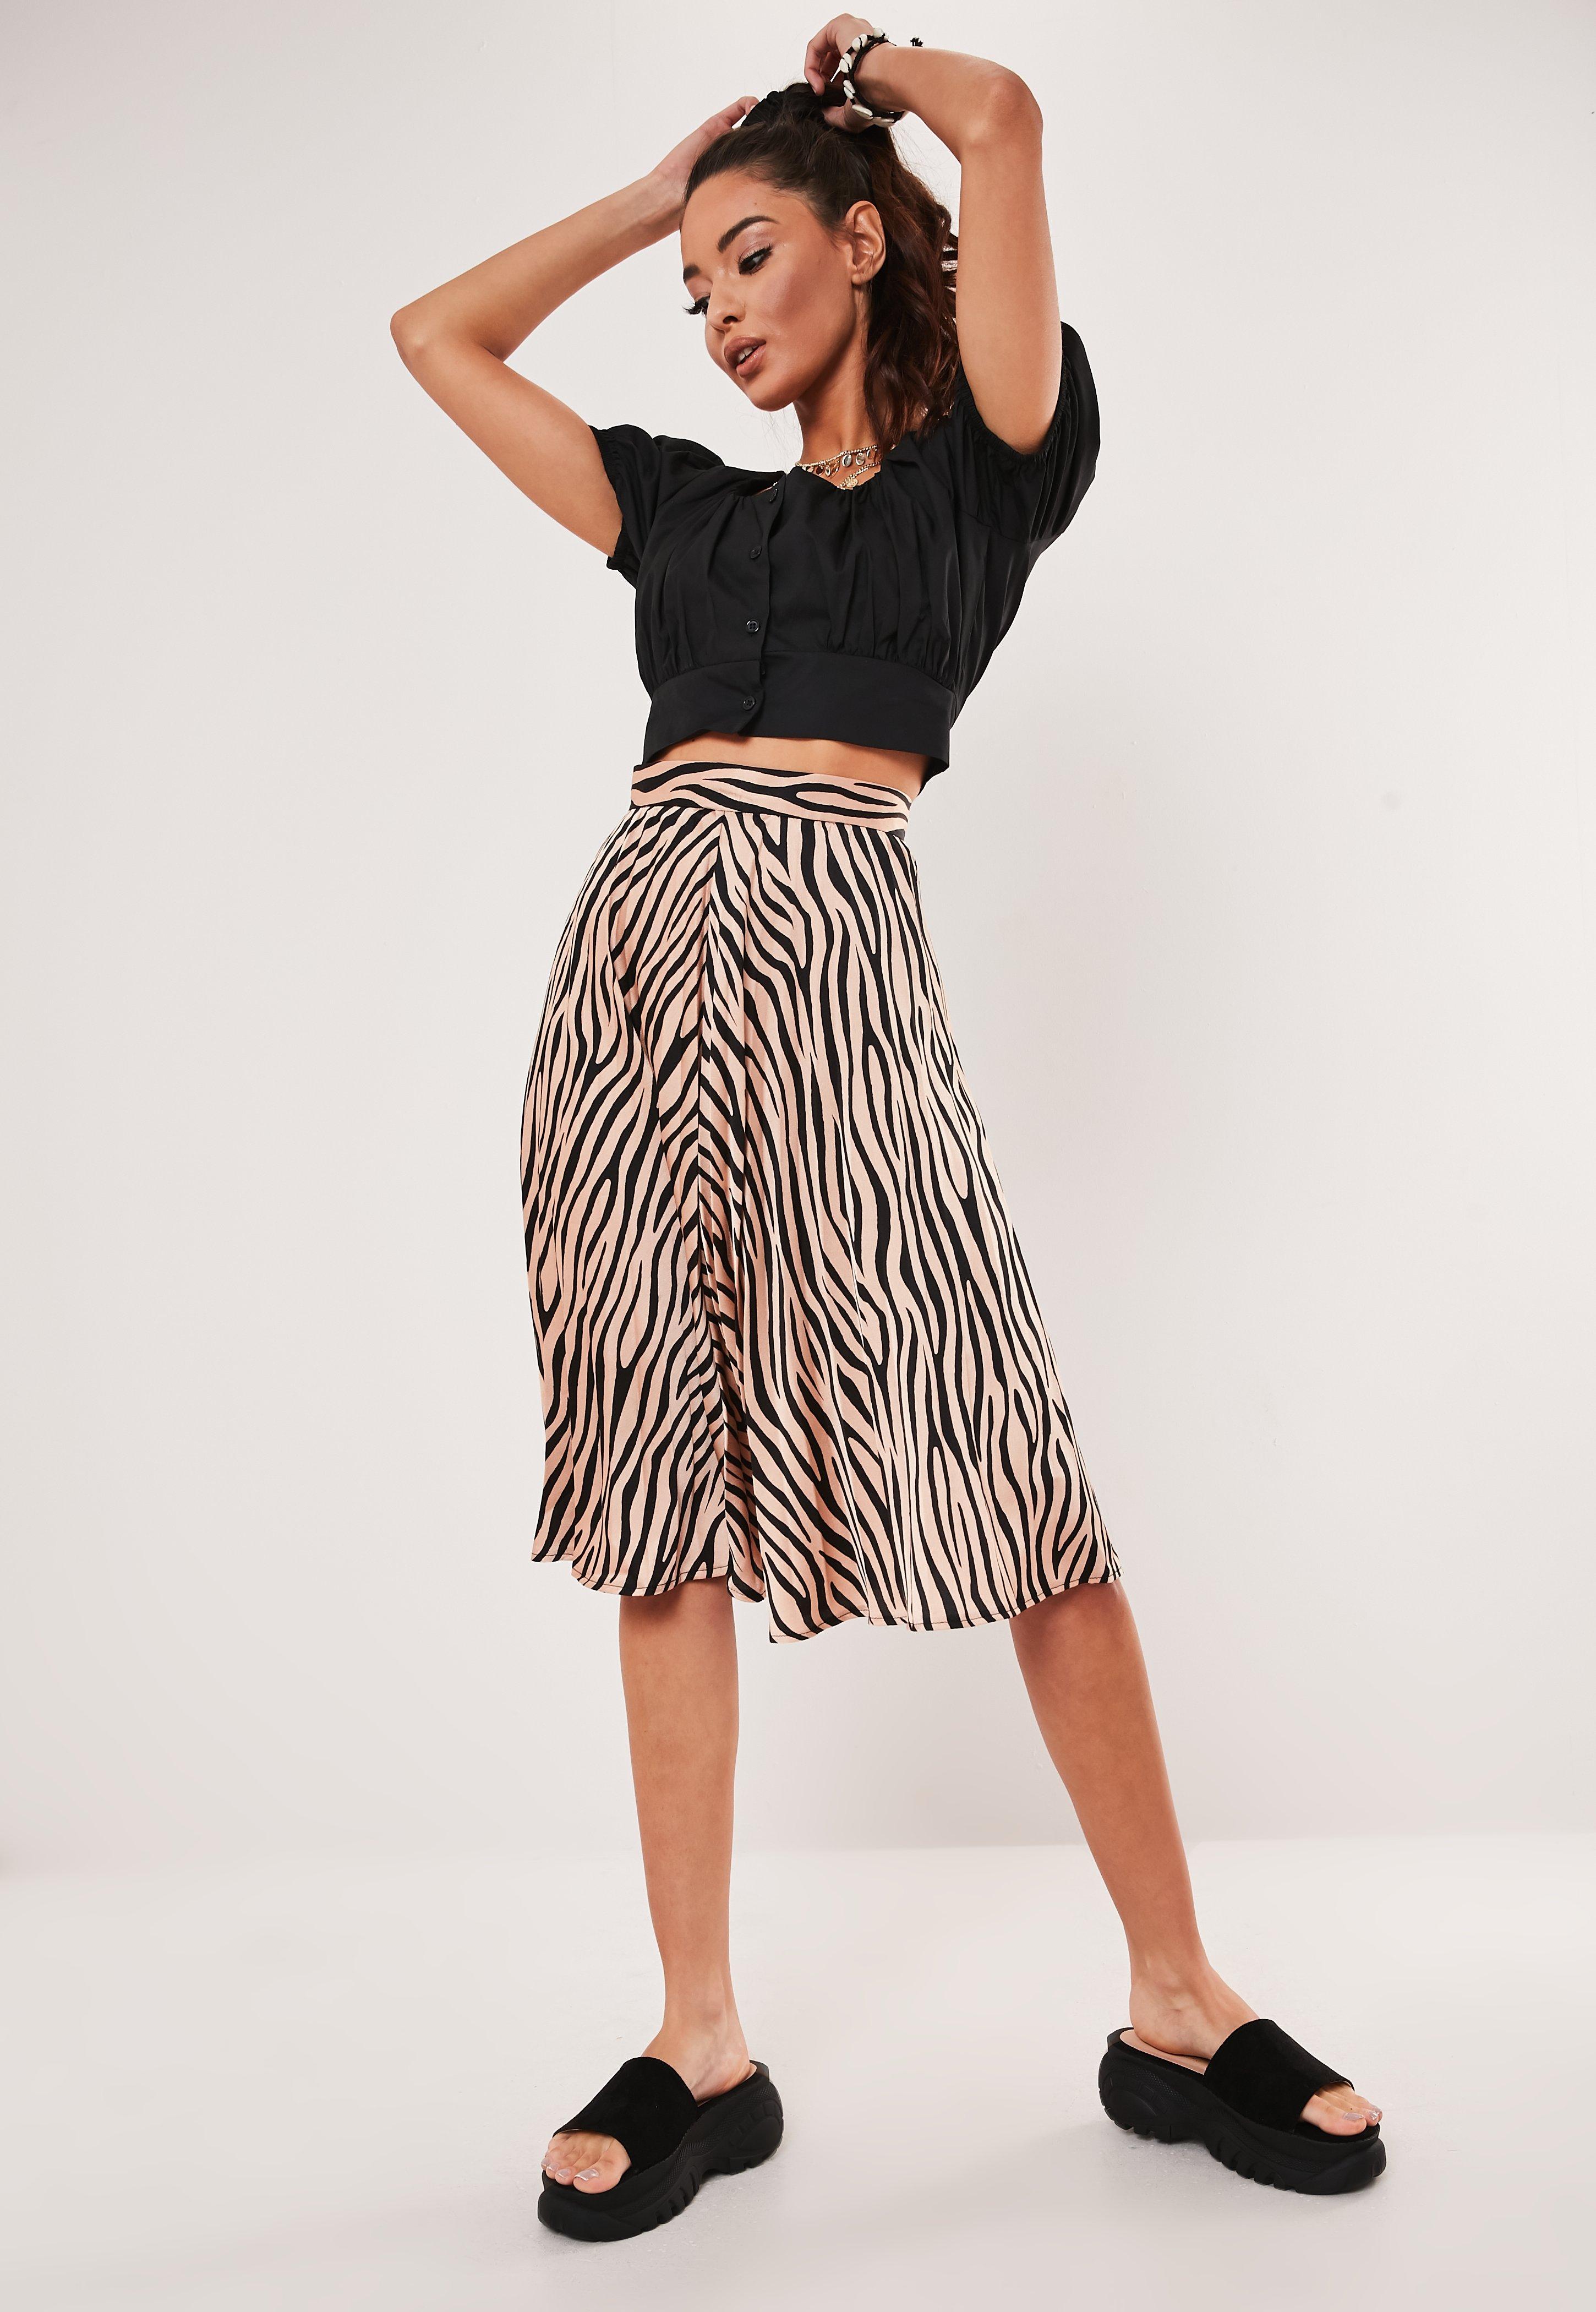 95c4a46ffe Petite Skirts, Womens Petite Maxi Skirts - Missguided